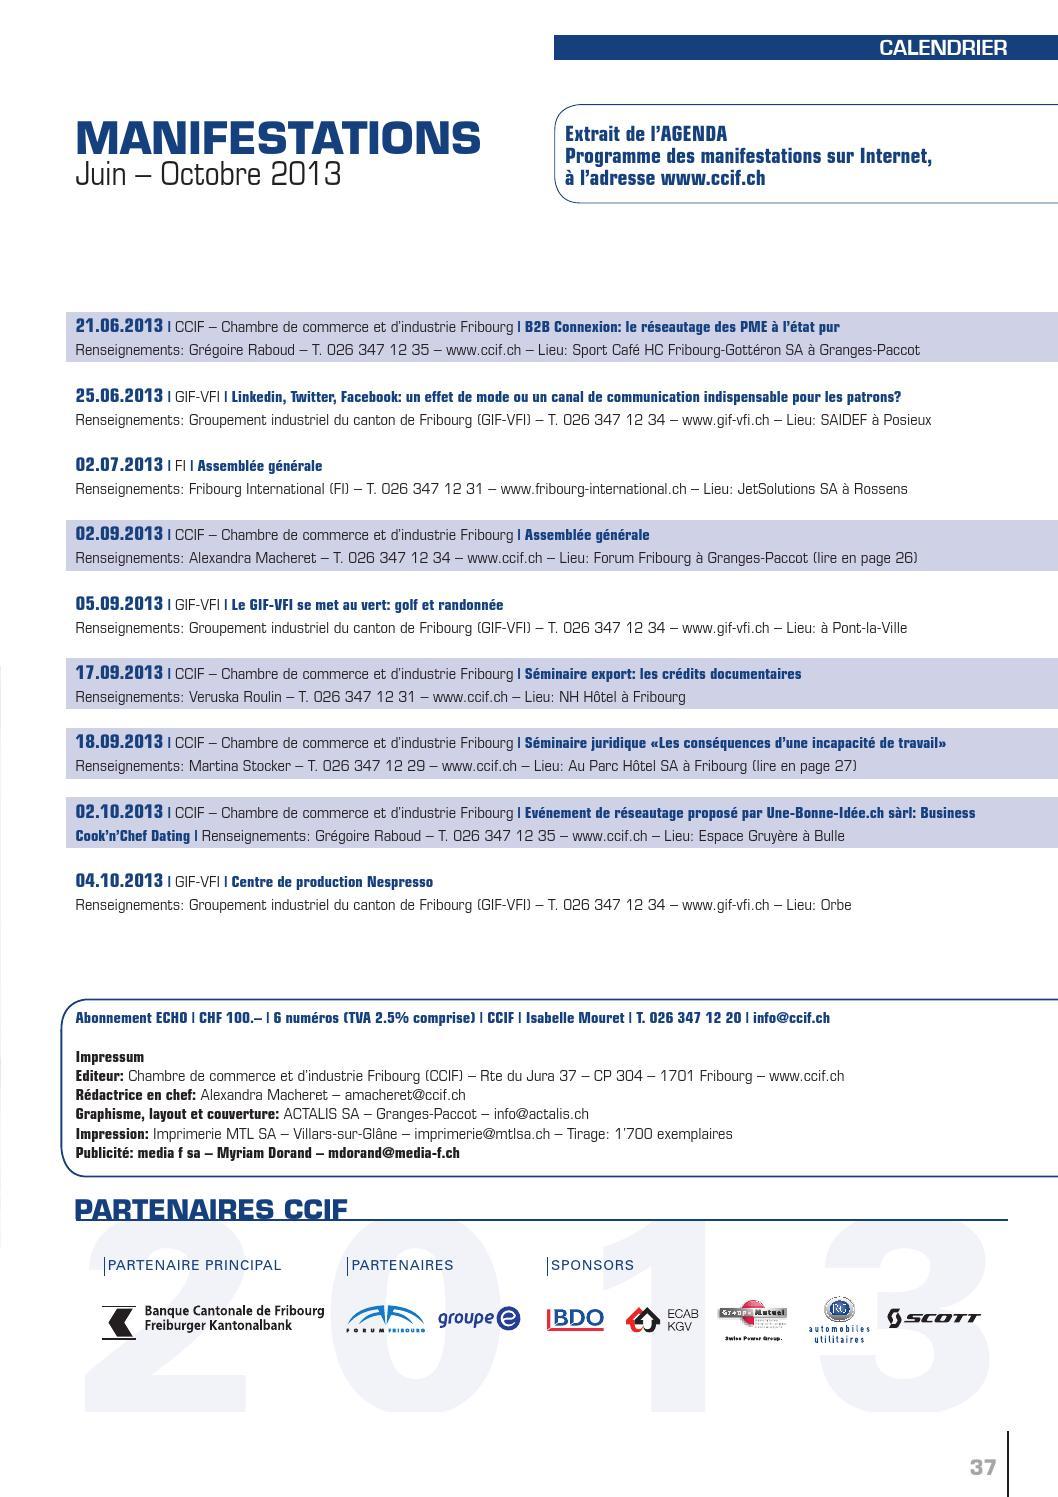 Sahli-Agro GmbH in Liquidation, Granges-Paccot - Contact